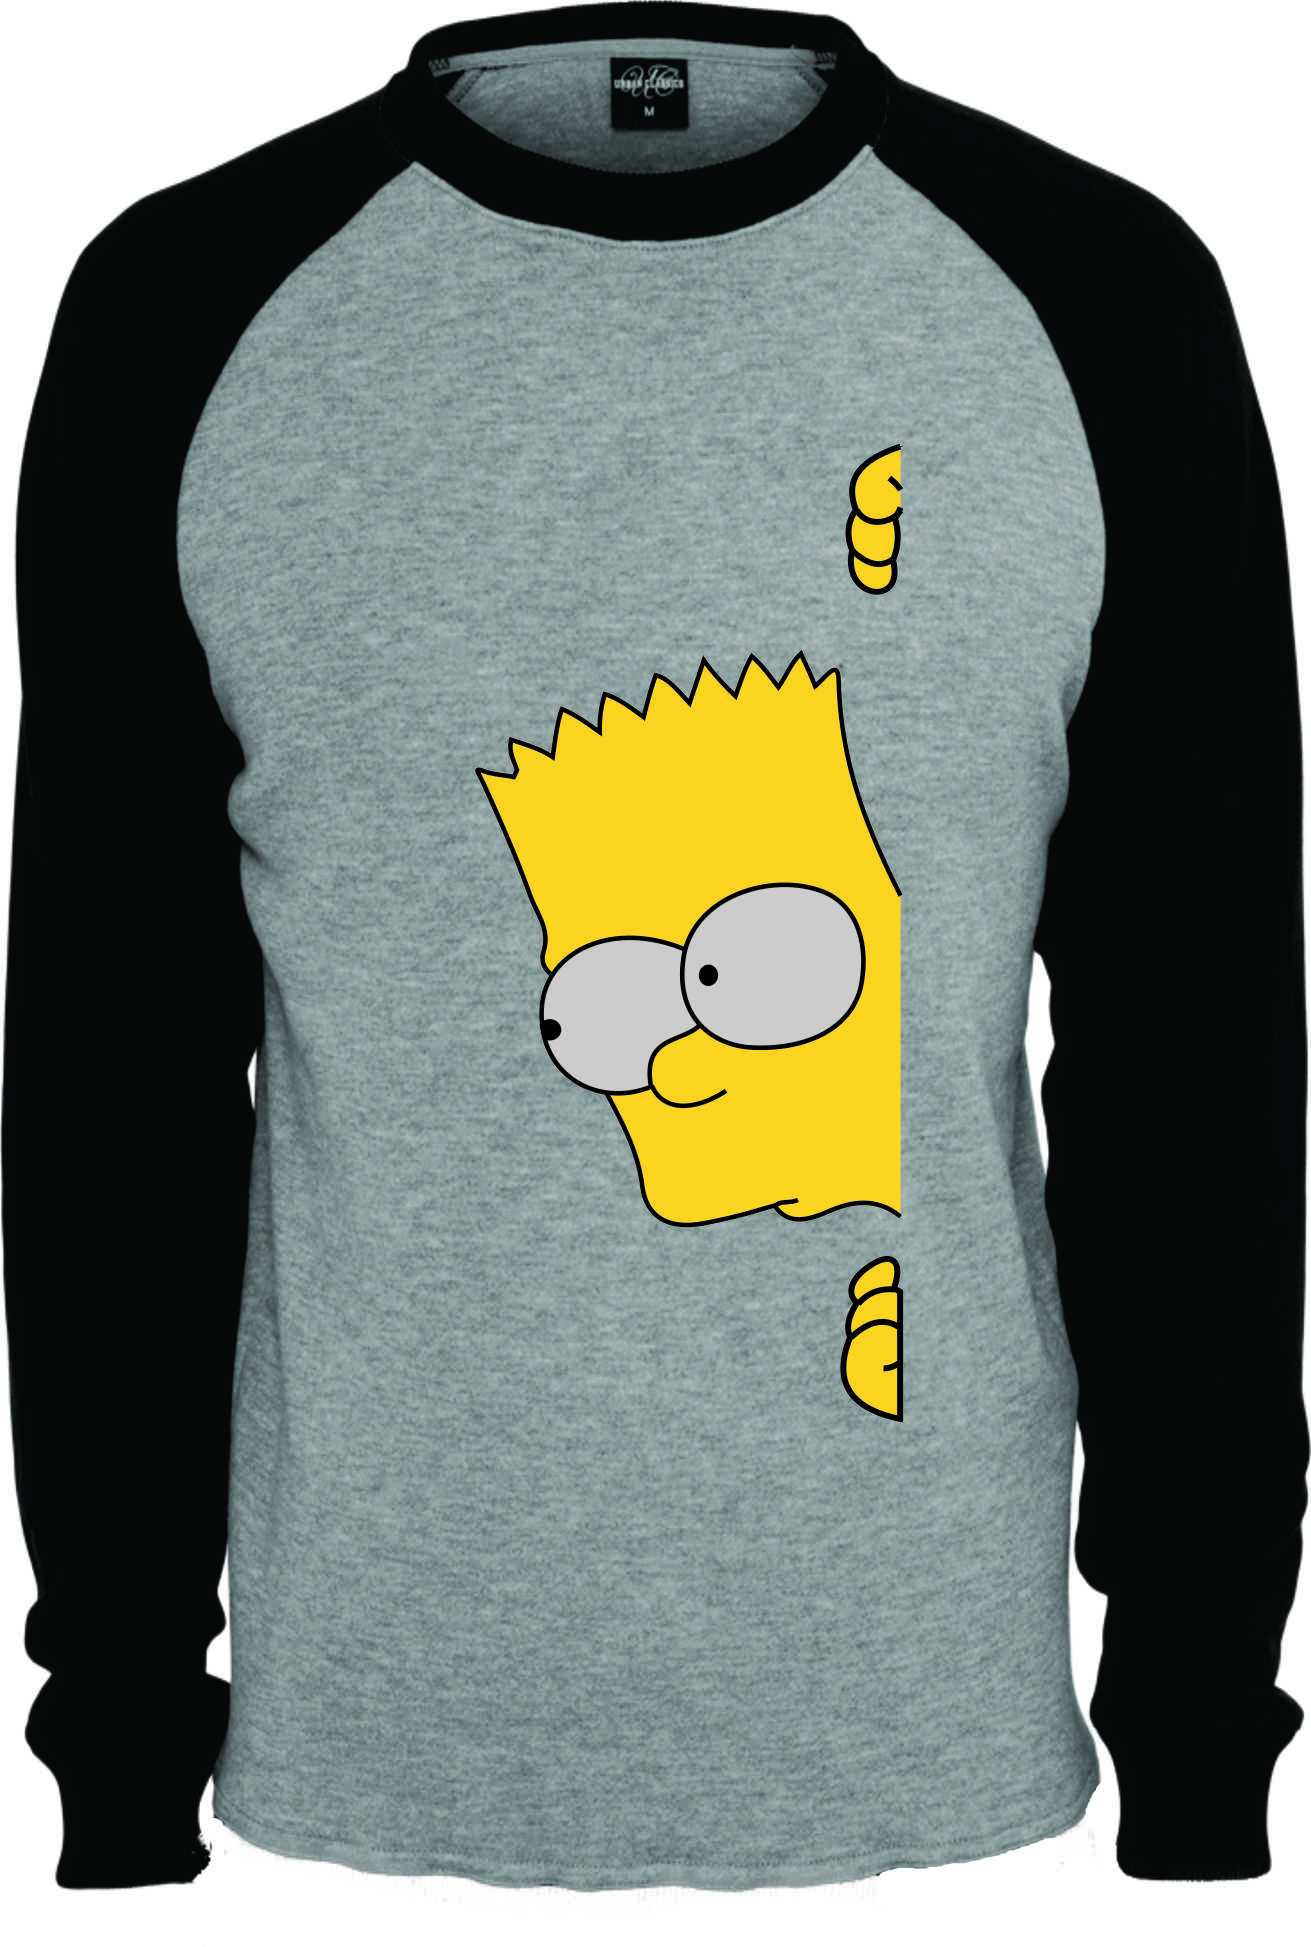 b779e9209 Camiseta Raglan Bart Manga Curt